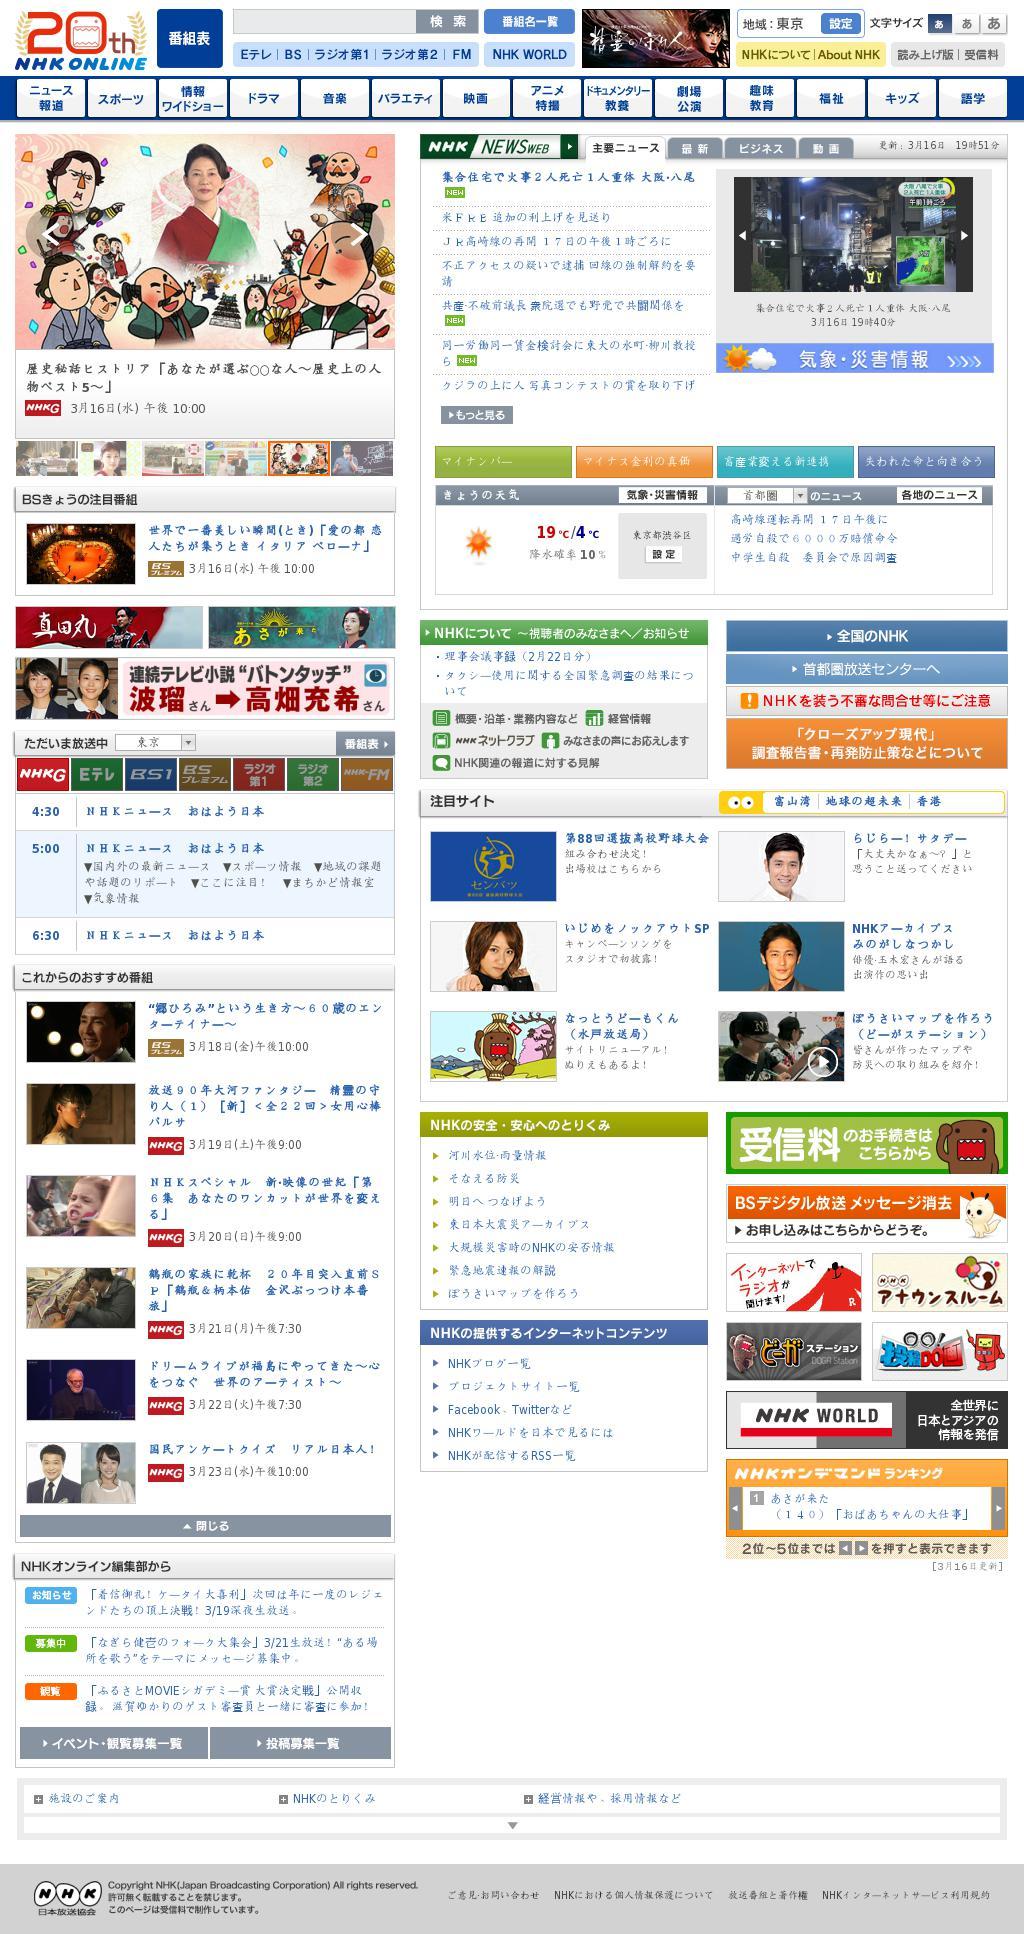 NHK Online at Wednesday March 16, 2016, 8:02 p.m. UTC